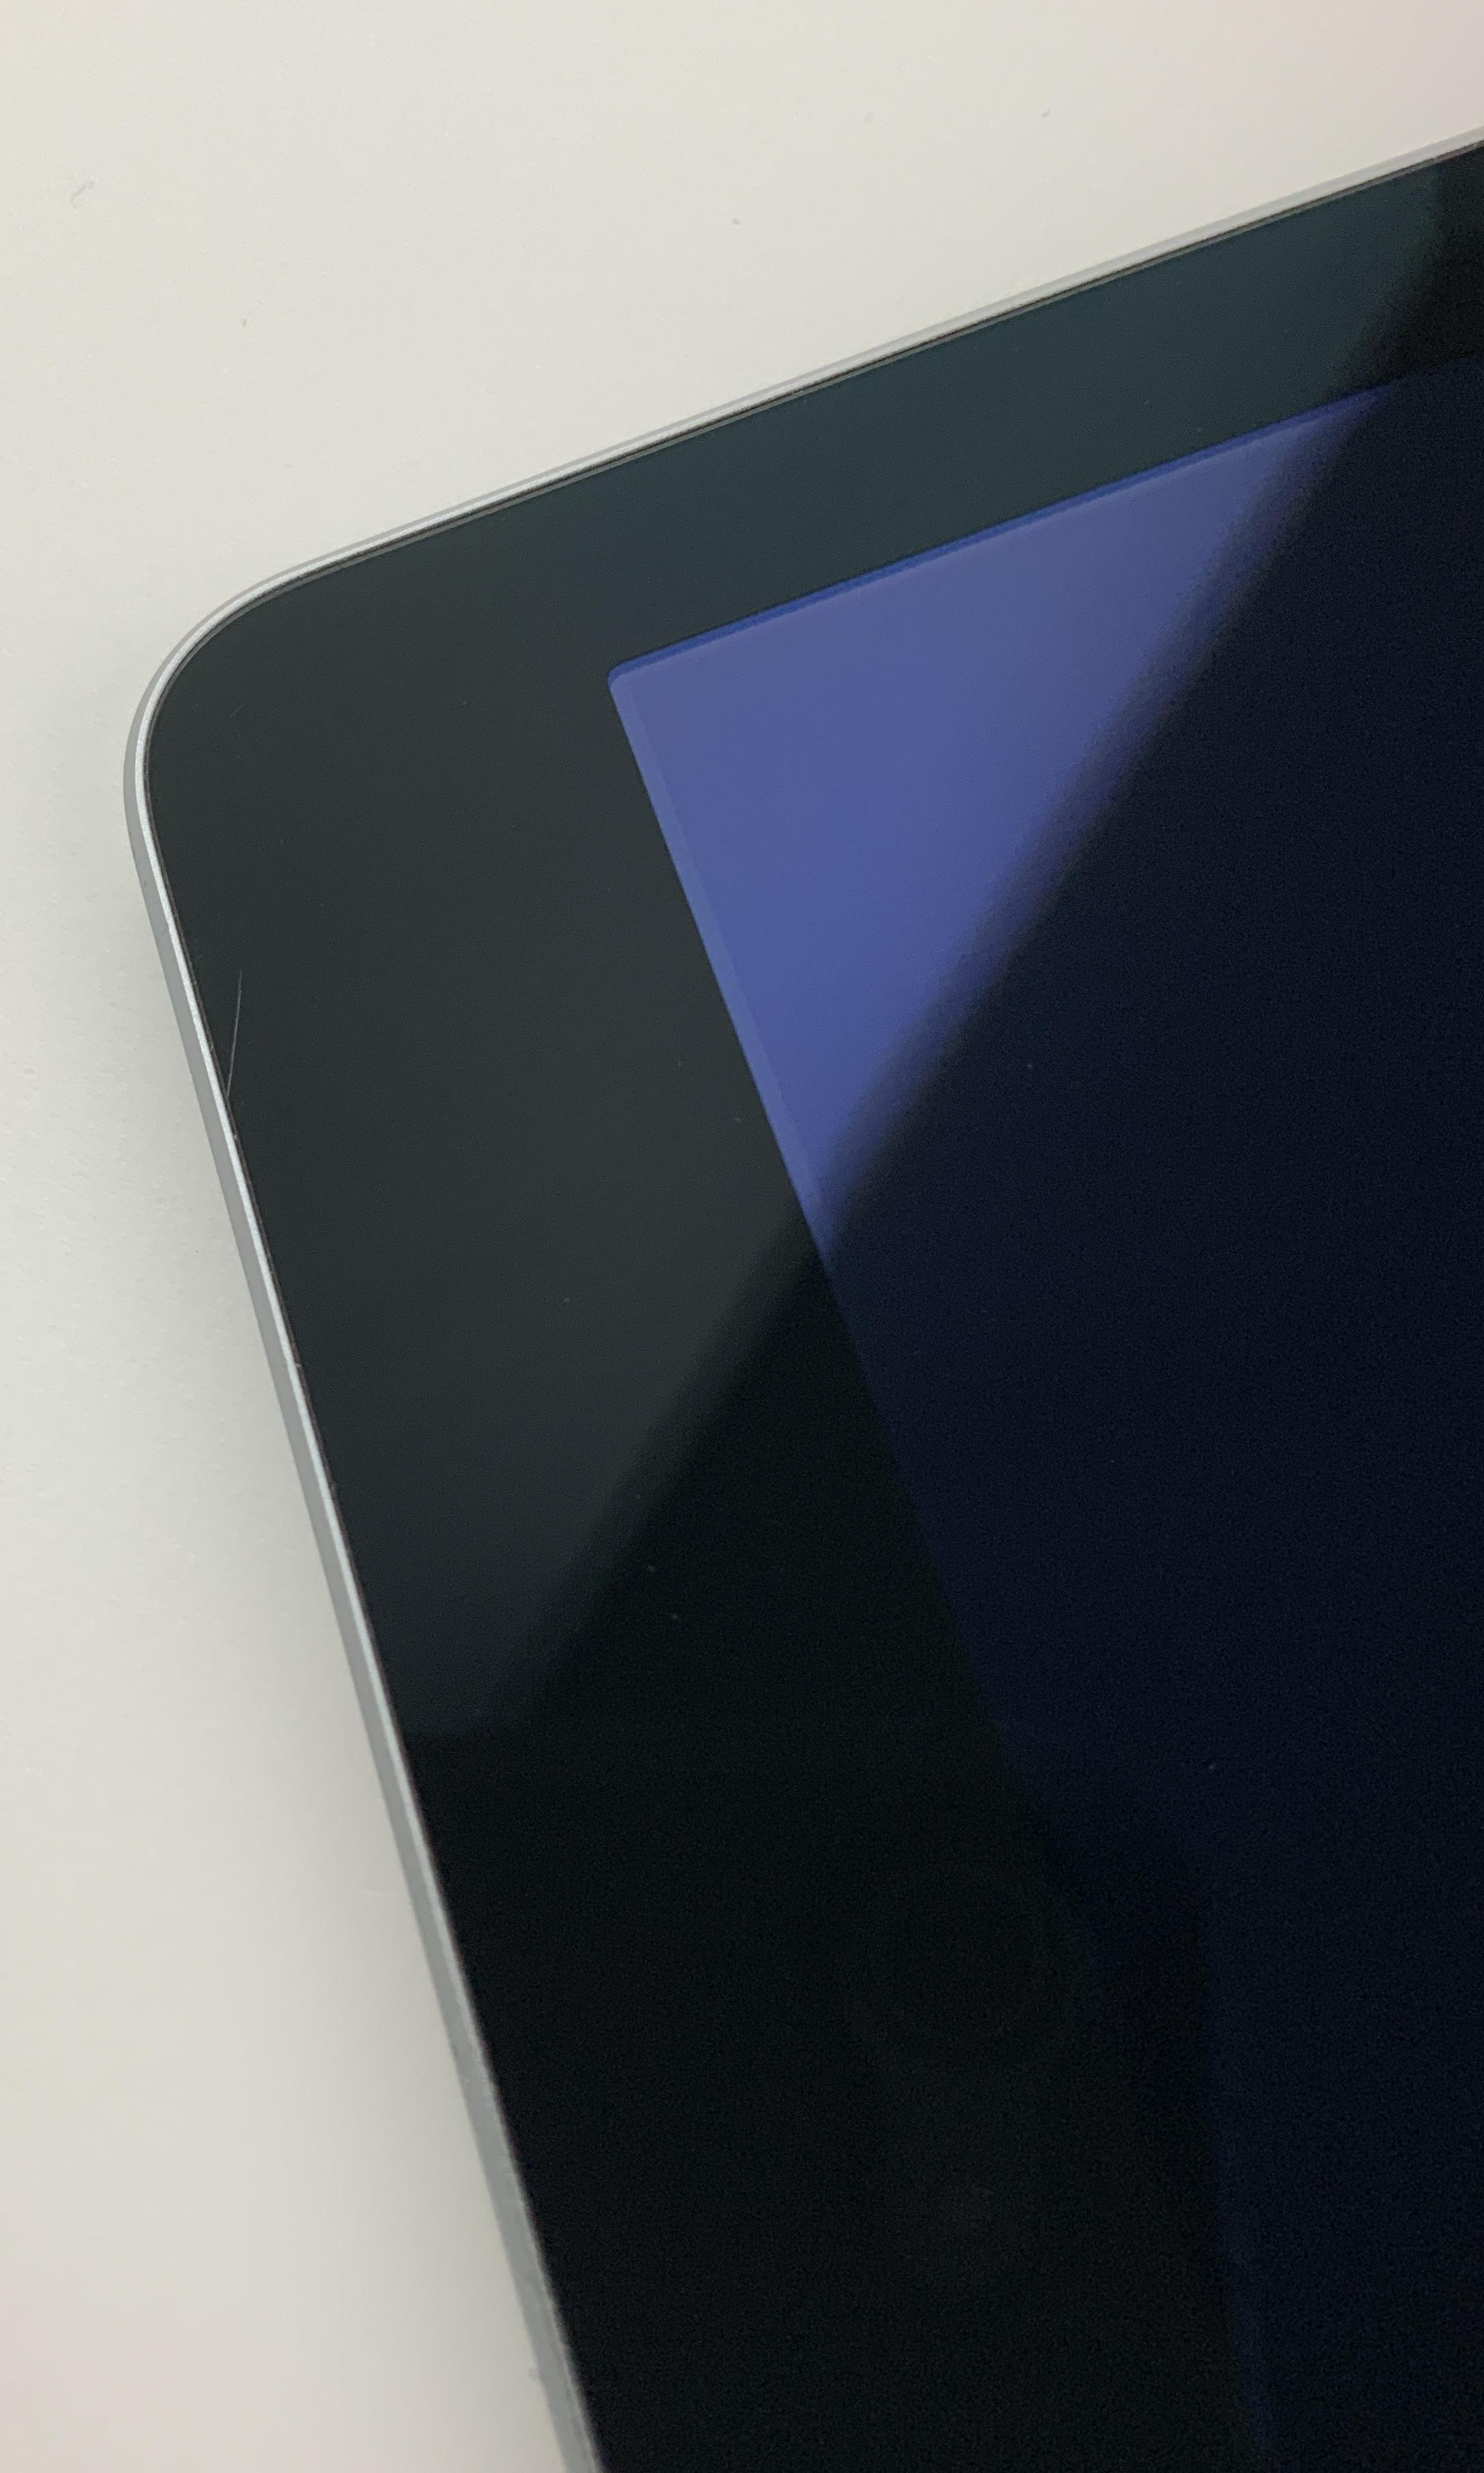 iPad Air 2 Wi-Fi + Cellular 64GB, 64GB, Space Gray, Kuva 4